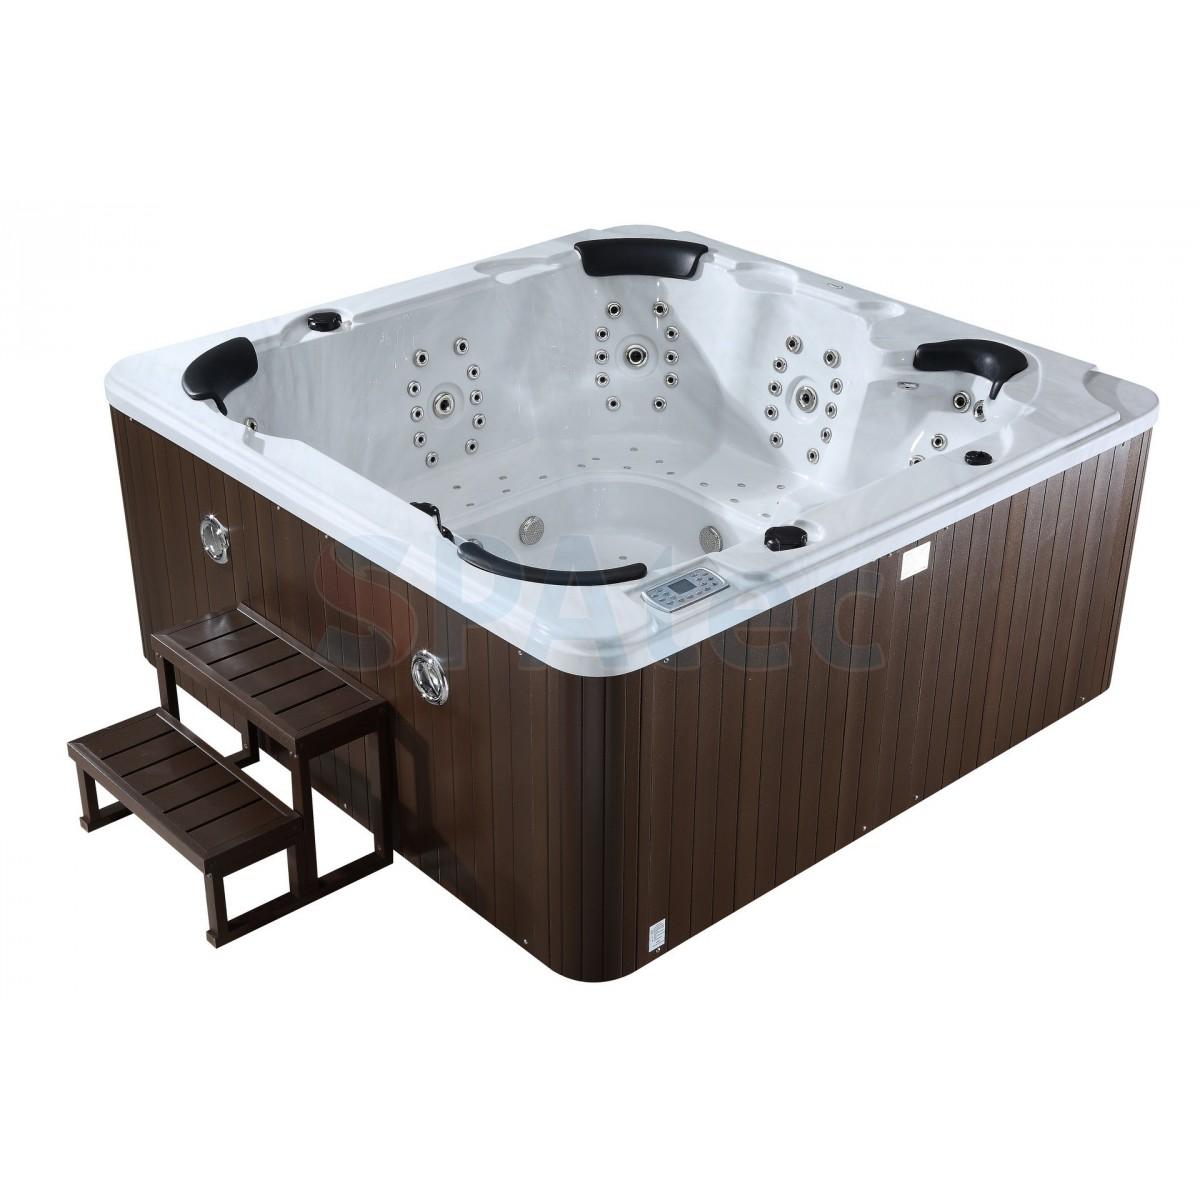 Spatec 800 blanc hydrostore - Salon exterieur blanc ...